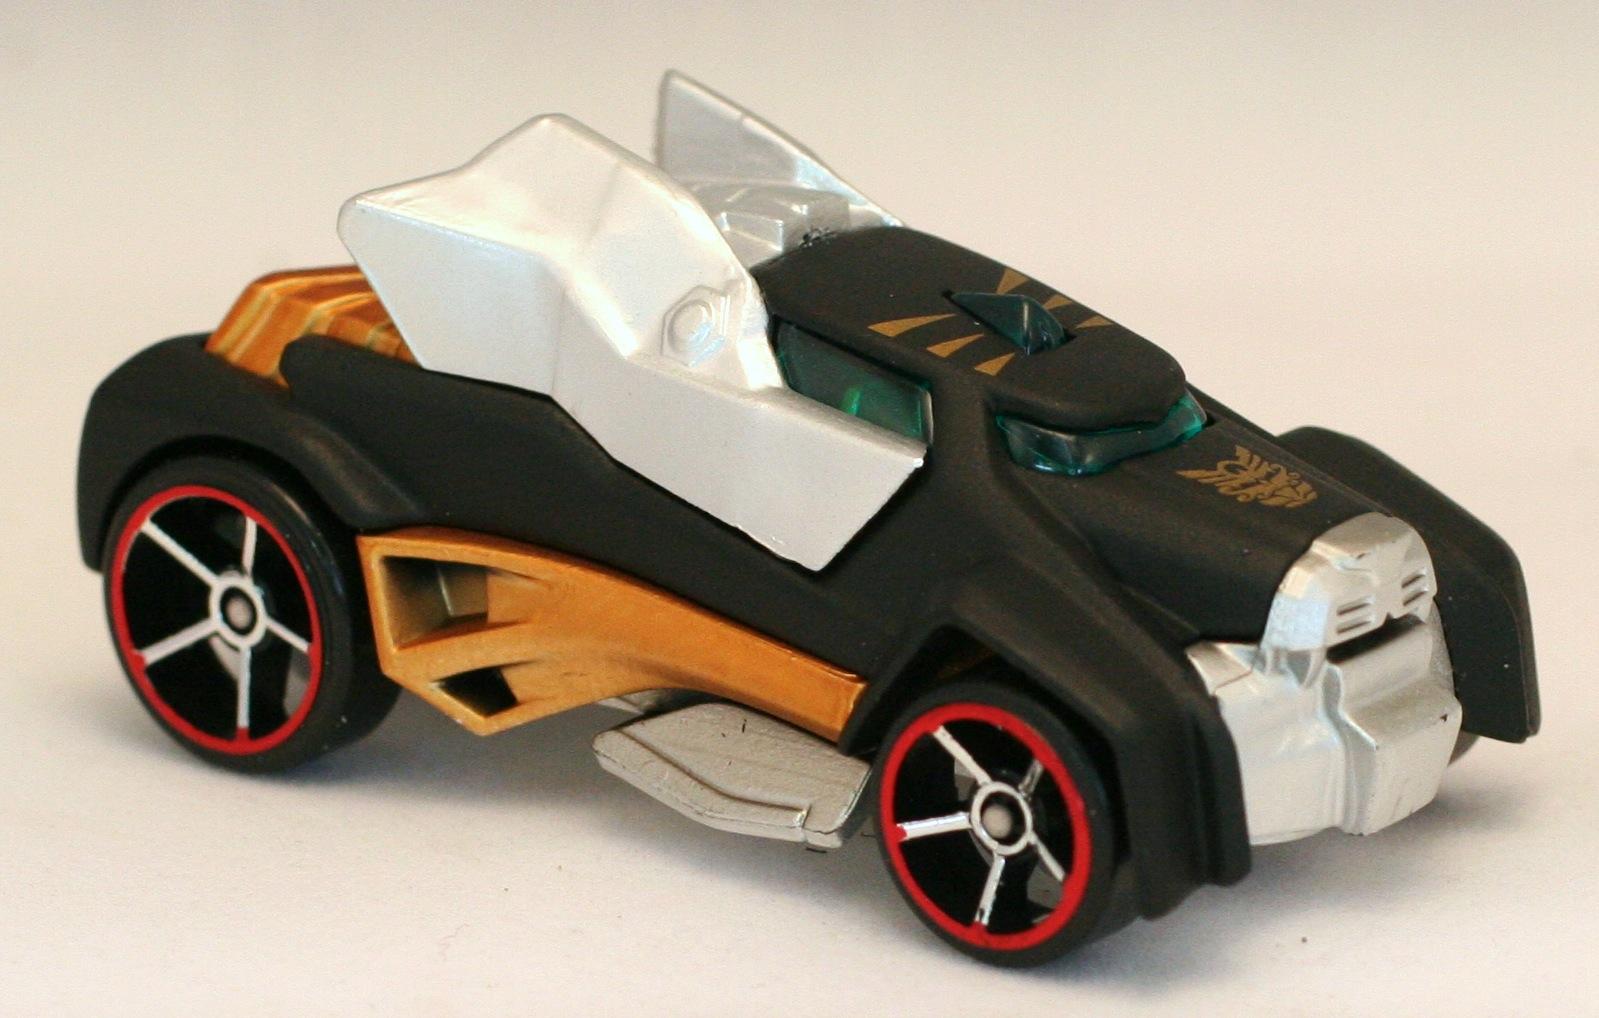 Robo Knight - Lion Zord | Hot Wheels Wiki | FANDOM powered by Wikia